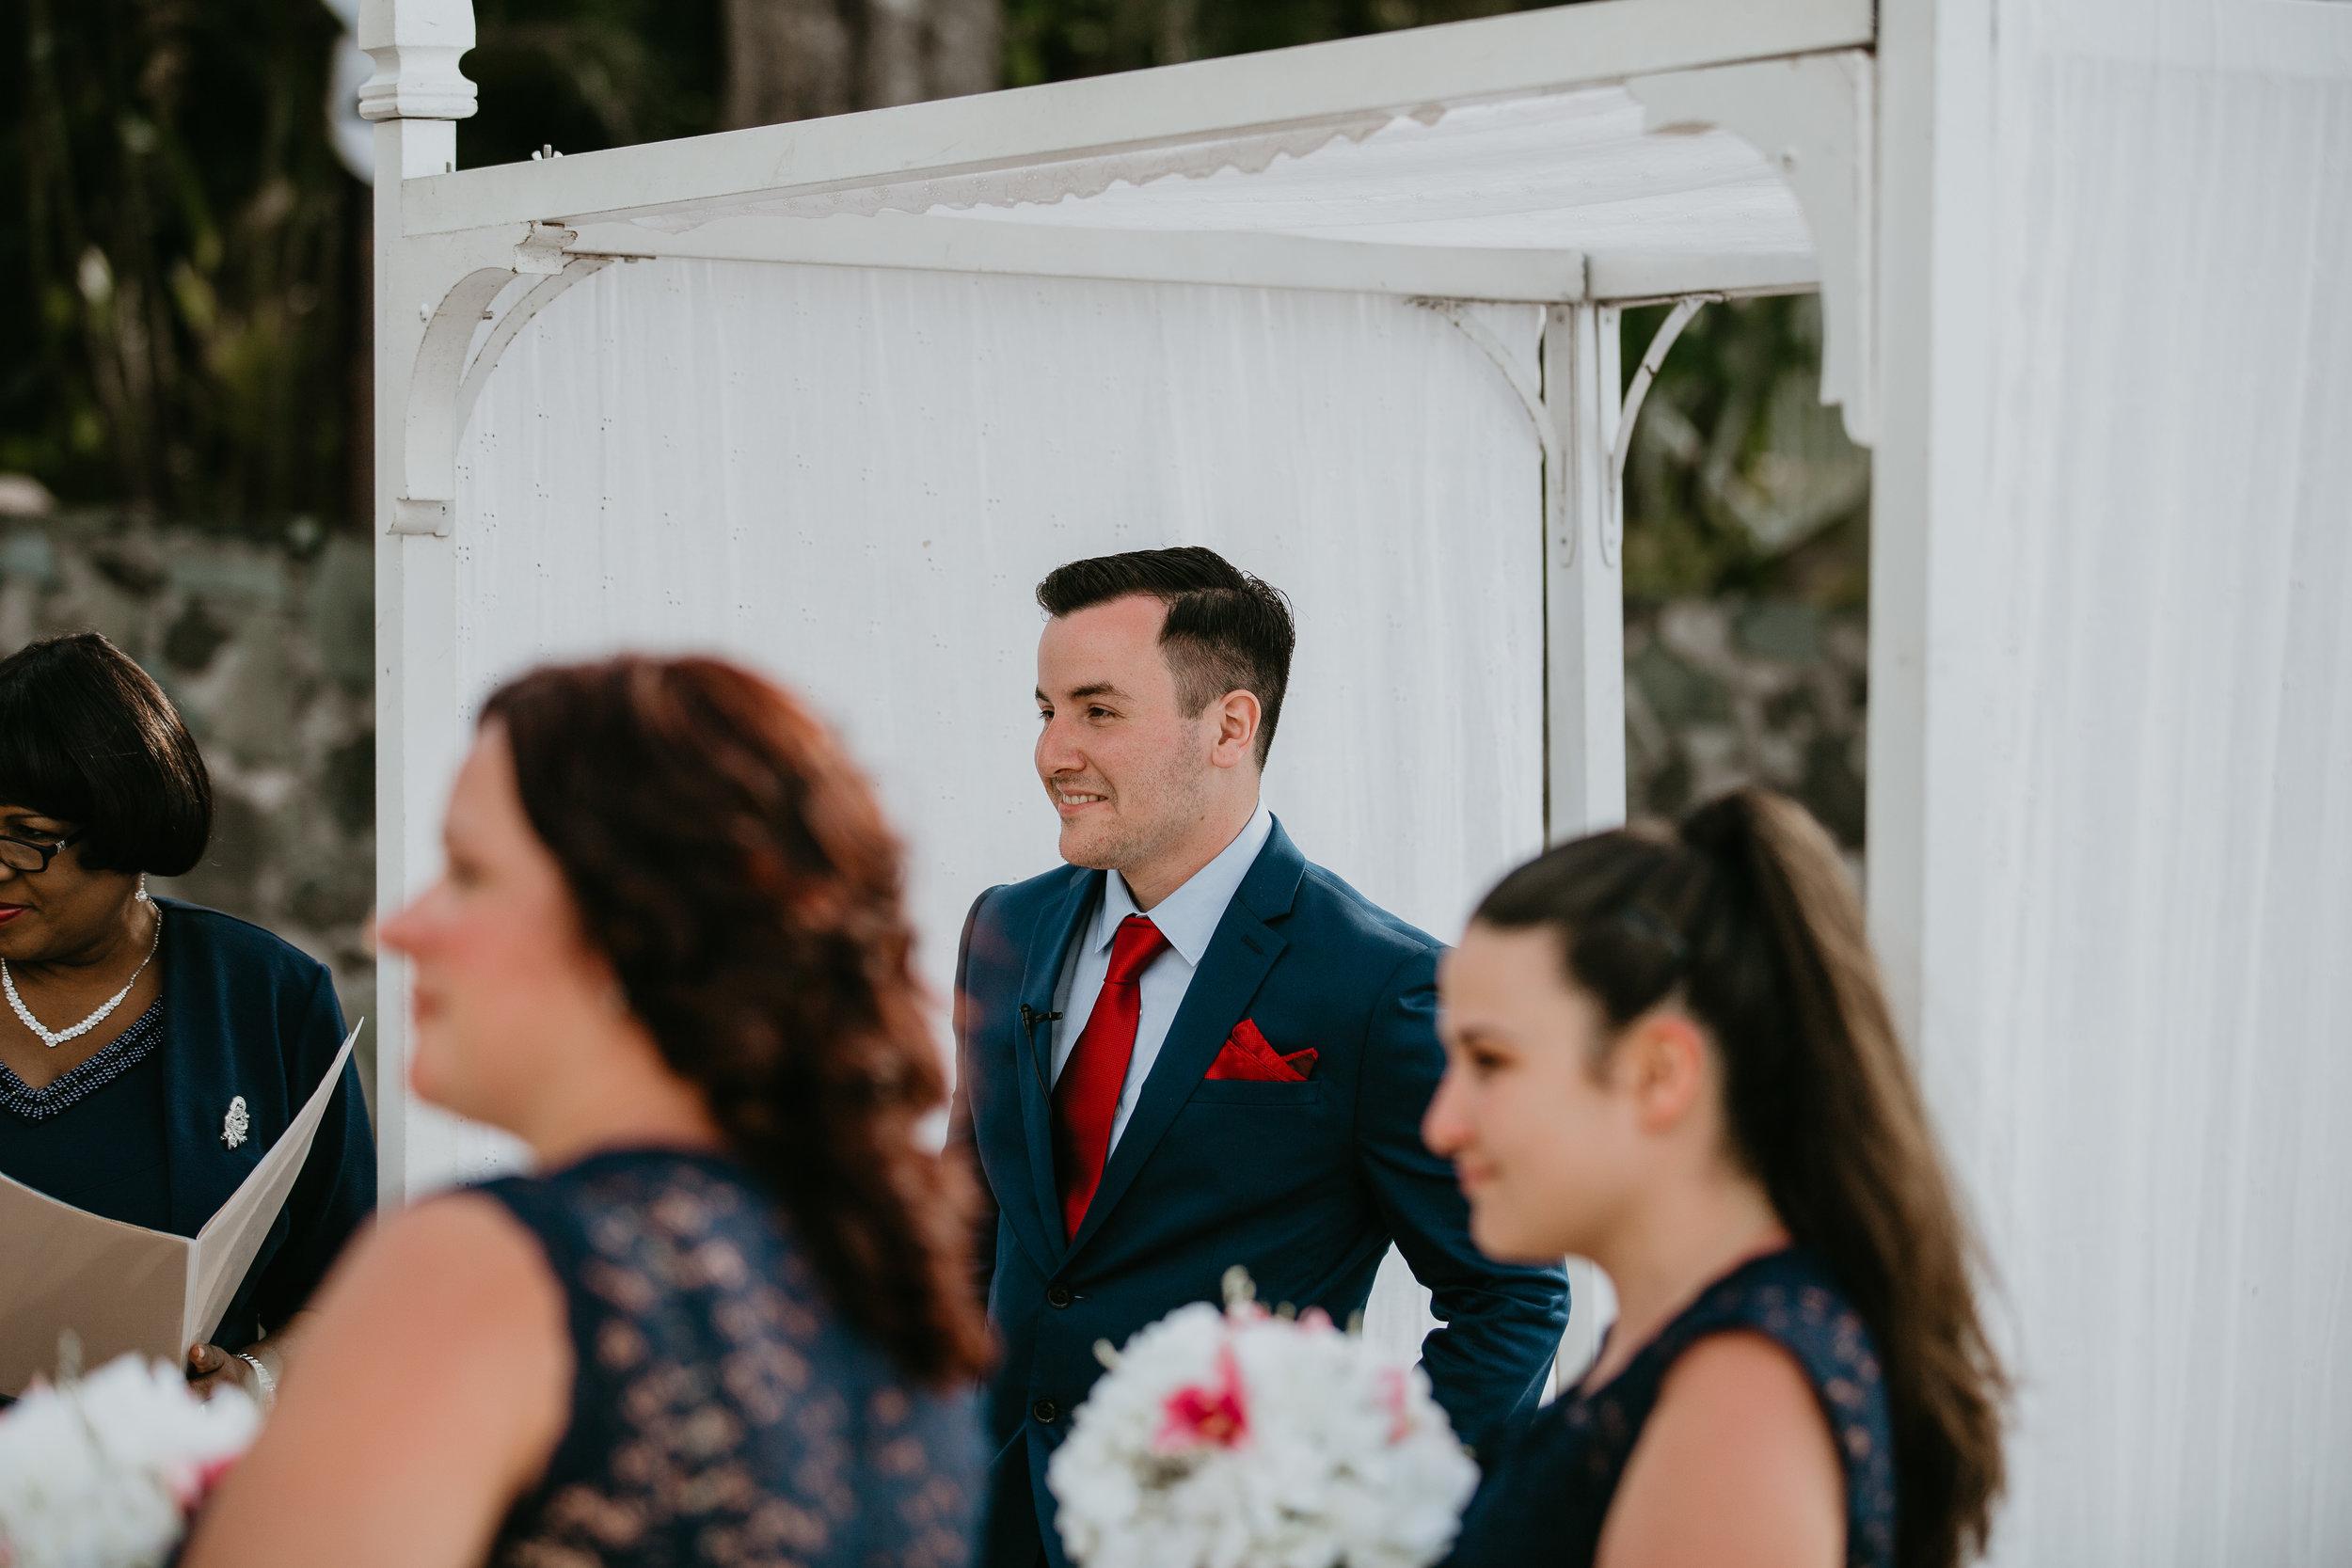 nicole-daacke-photography-destination-wedding-in-st-lucia-sandals-la-toc-intimate-island-wedding-carribean-elopement-photographer-chill-island-wedding-58.jpg